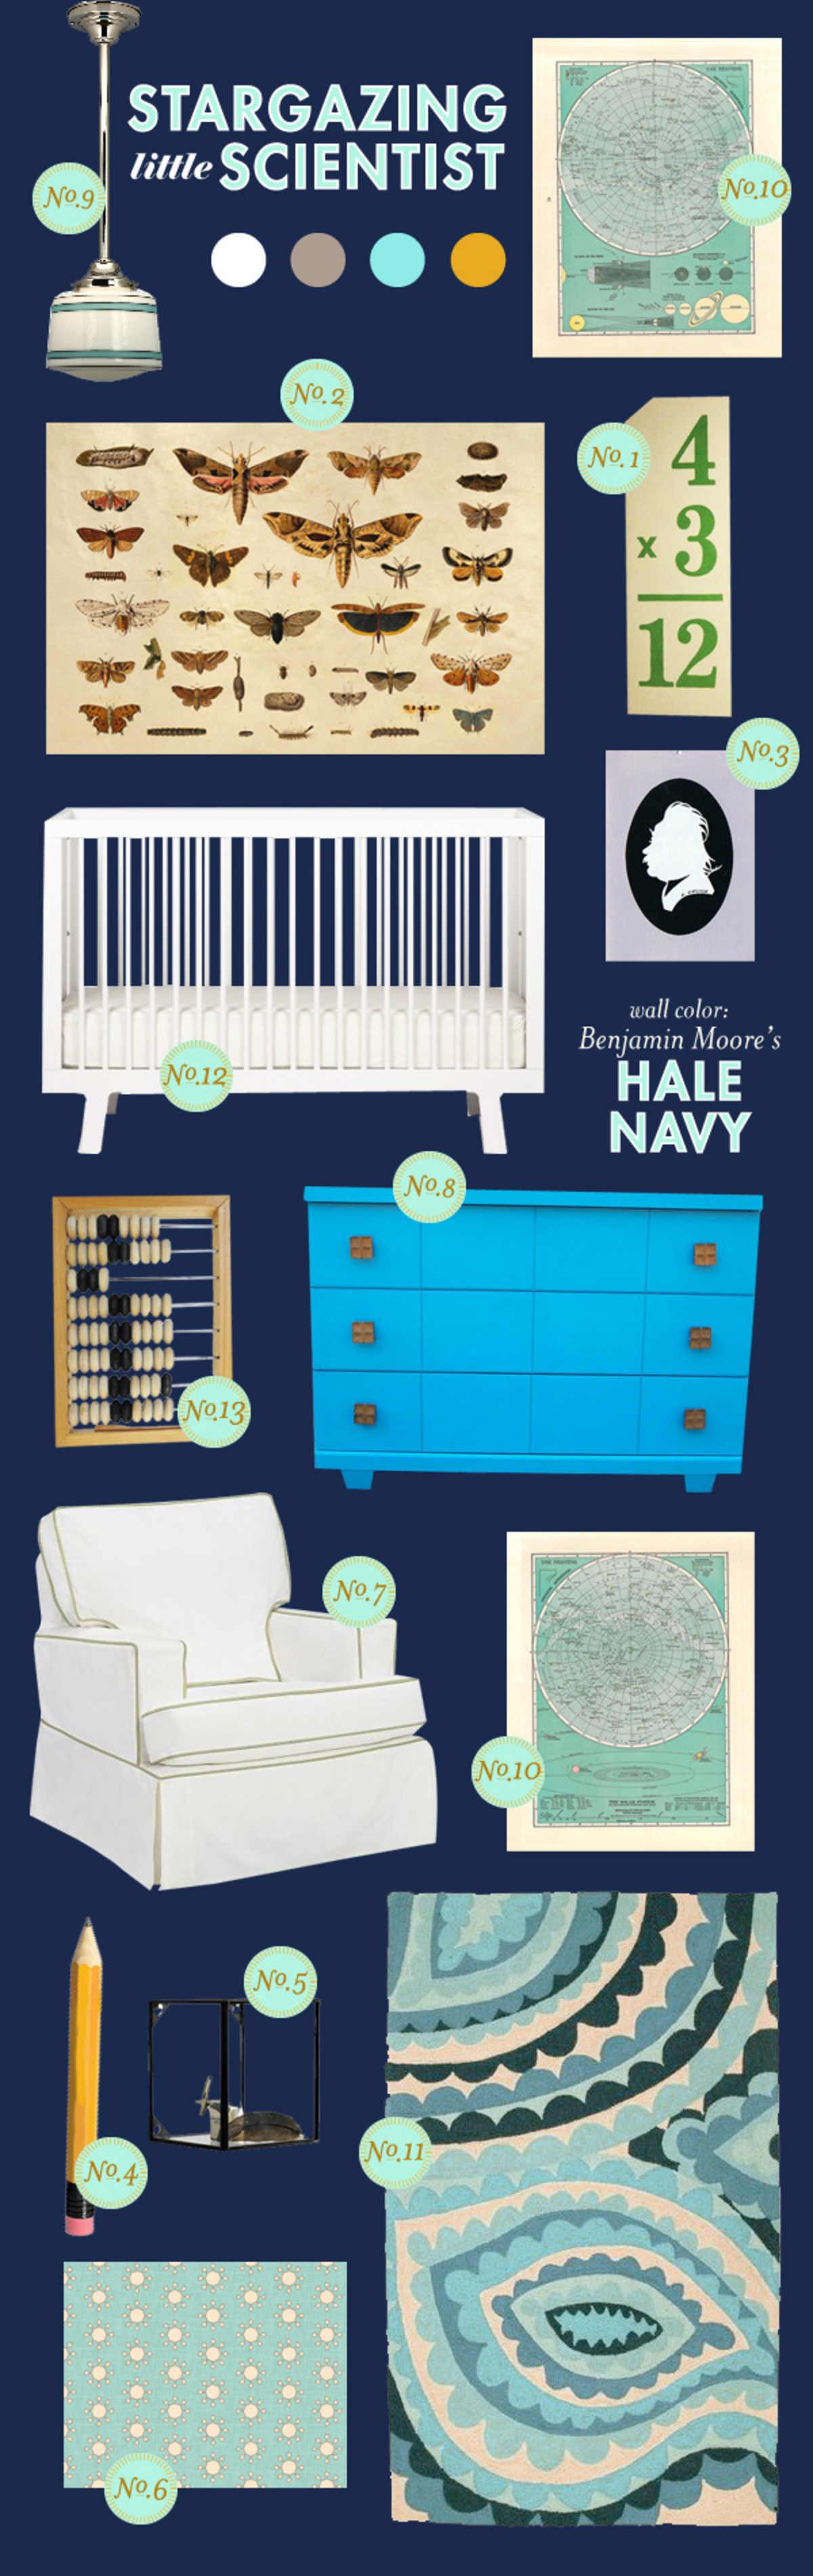 science navy baby nursery ideas